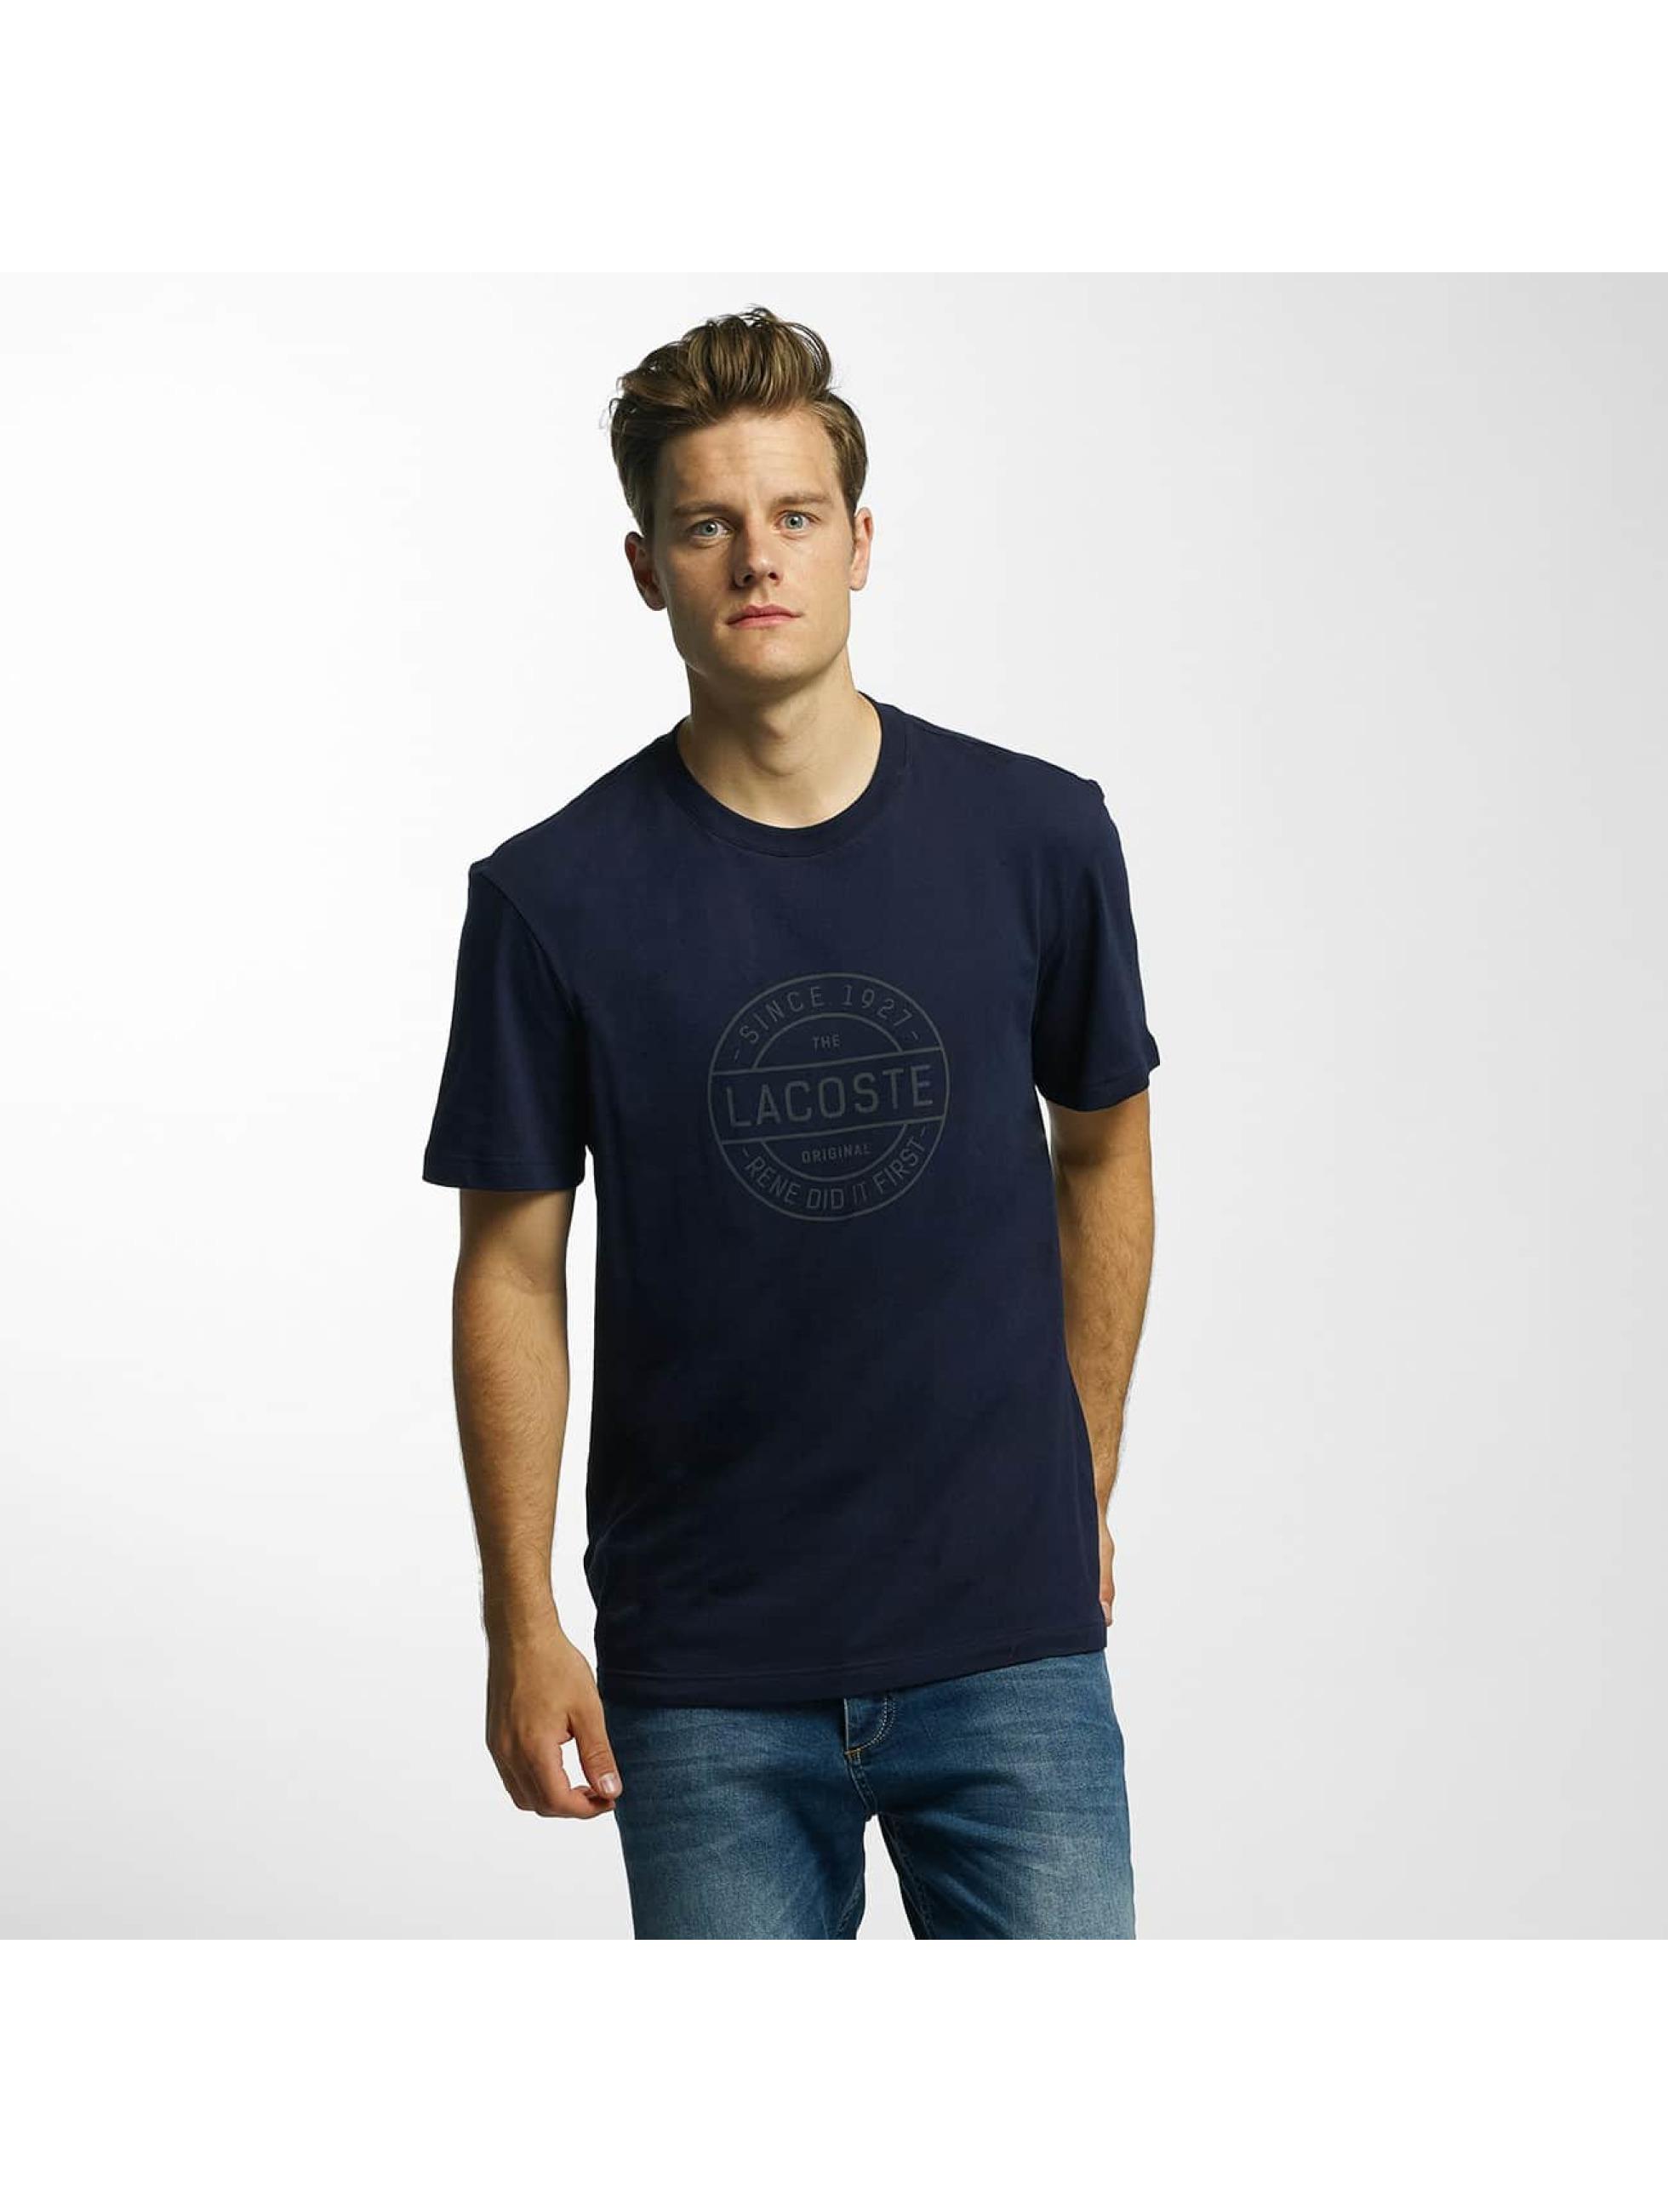 Lacoste T-Shirt Original blau